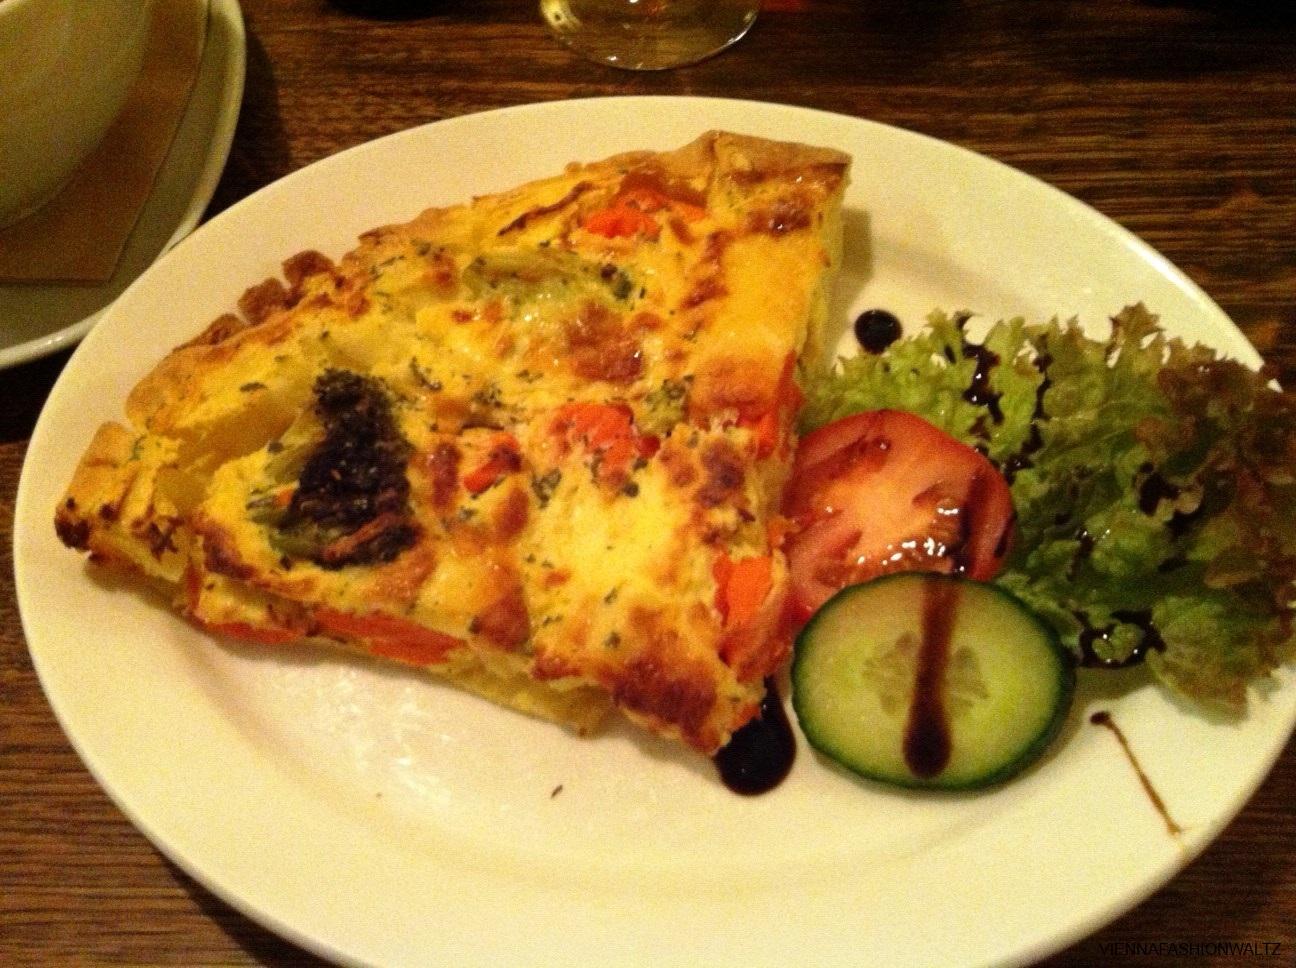 le bol - Die besten Restaurants in Wien!